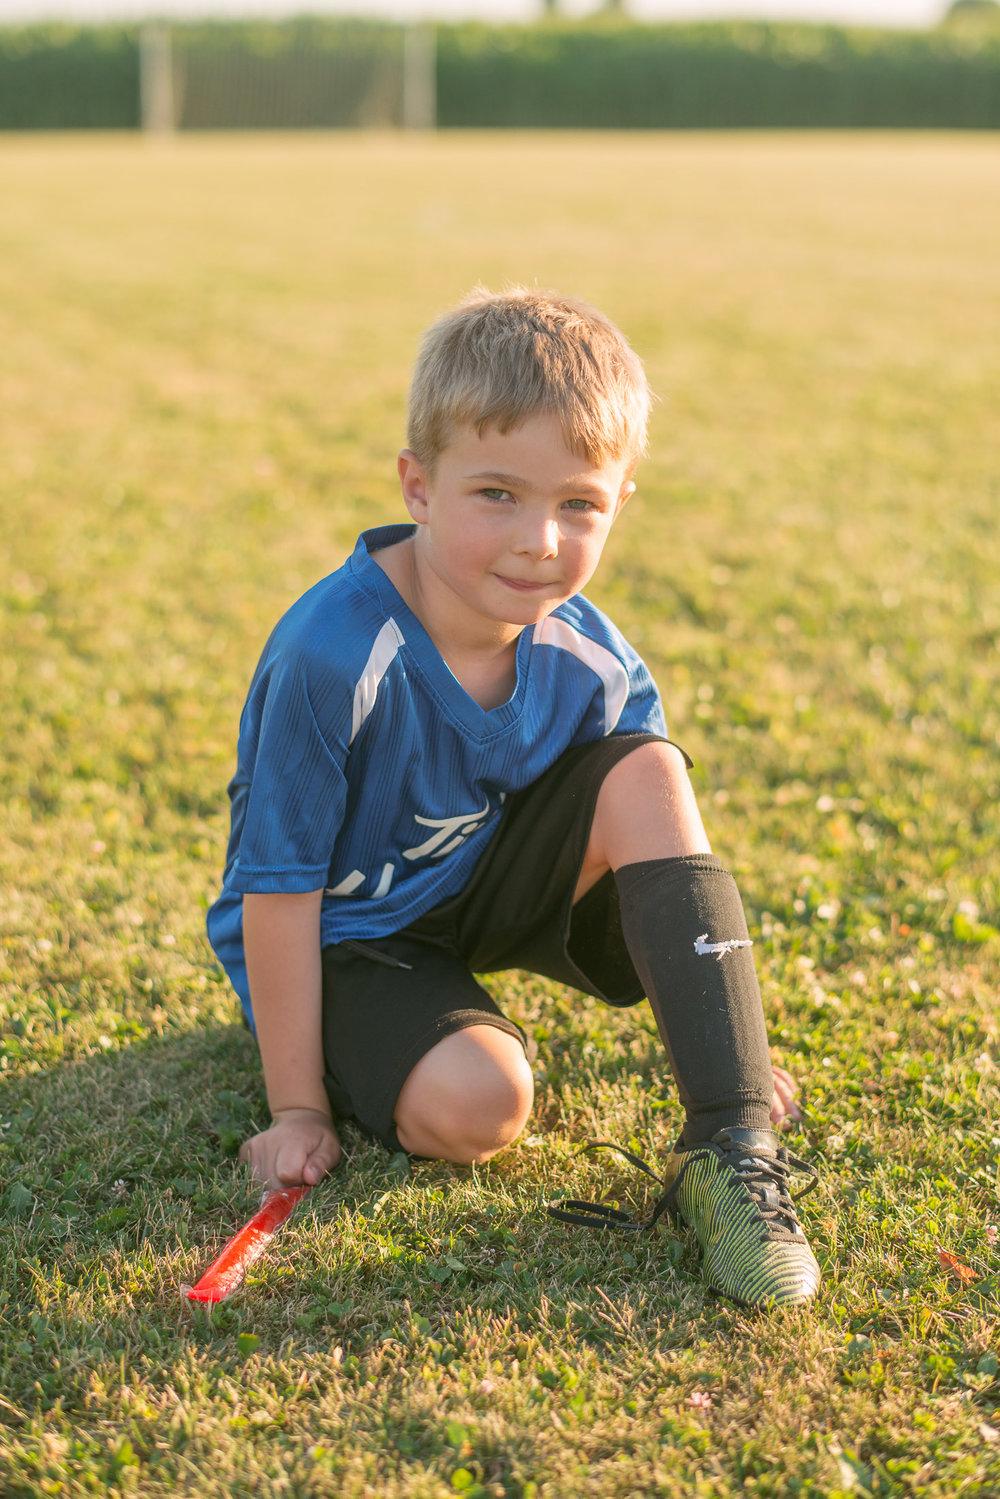 Kinkora-Soccer-Photos-007.jpg